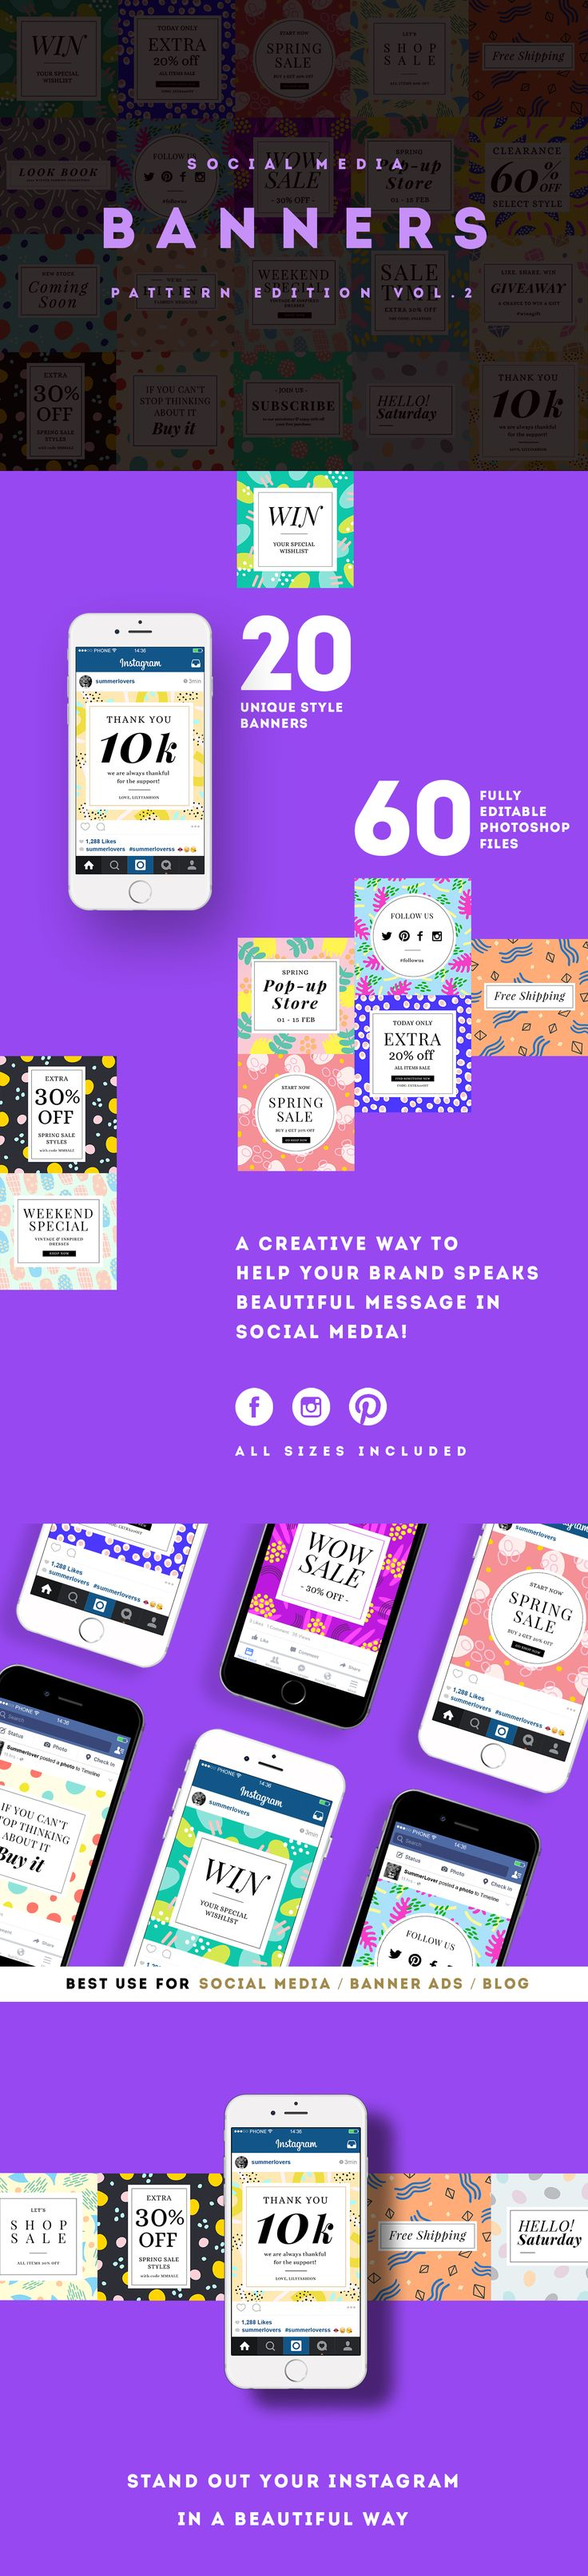 Social Media Banners Design Best for Instagram, Facebook &  Pinterest